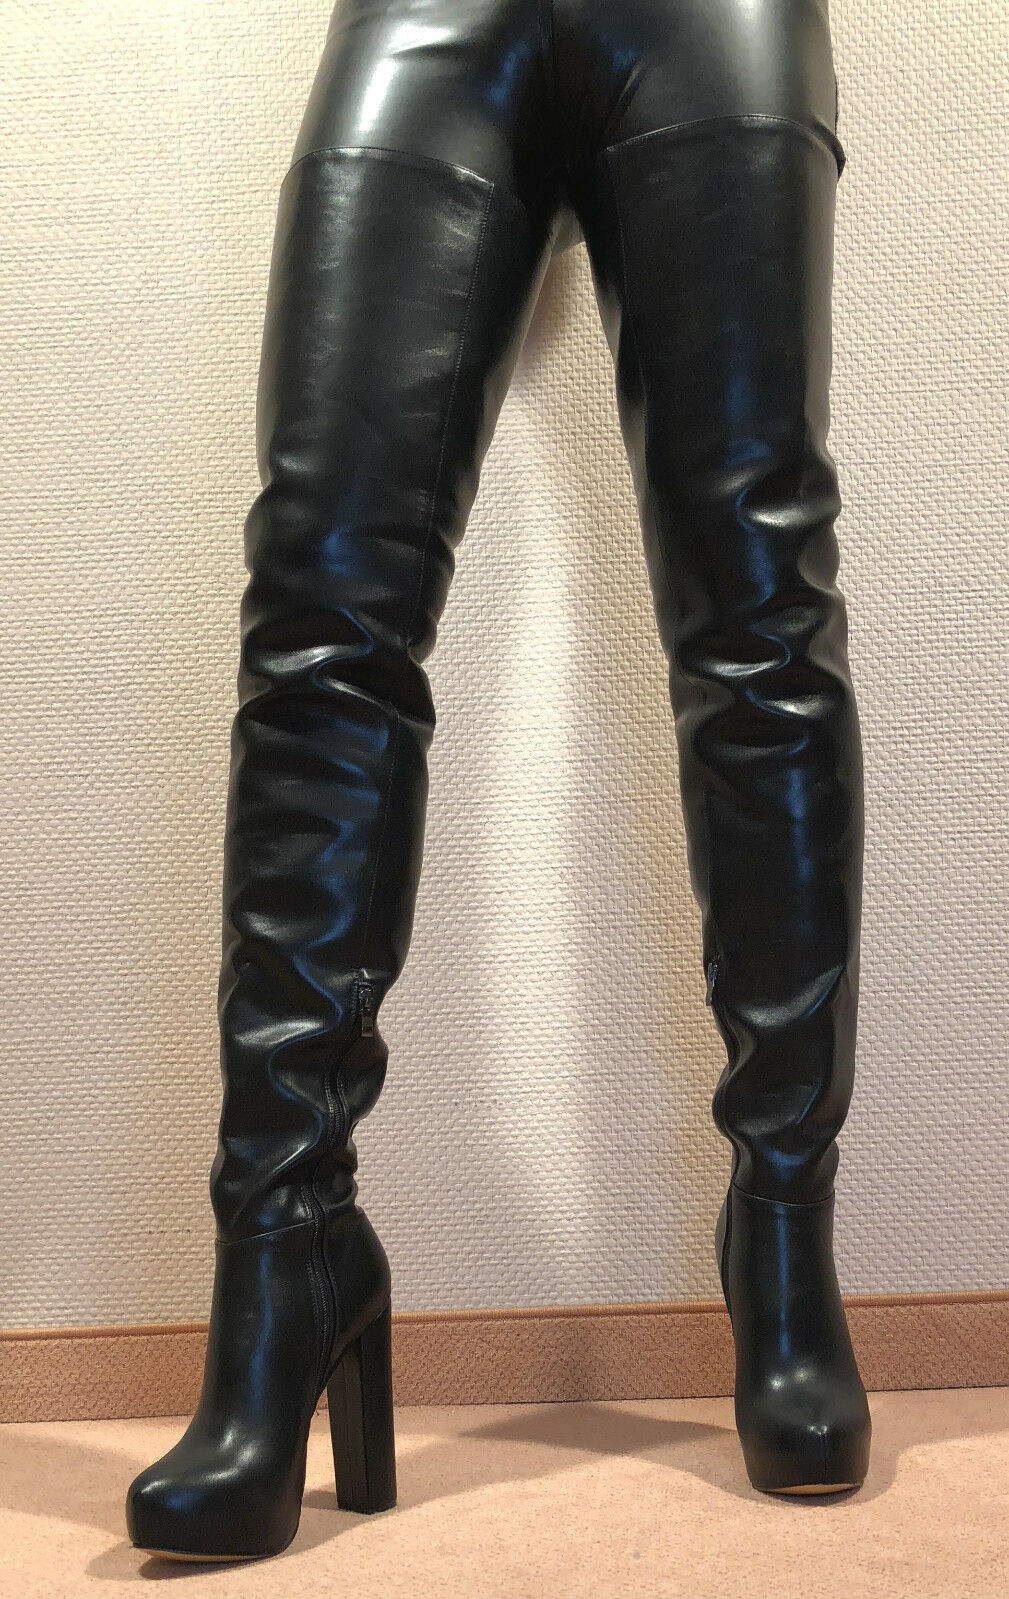 Gr.46 TOP ! Exklusiv Sexy Damen Schuhe Overknee Stiletto Stiefel Männer Boots D4